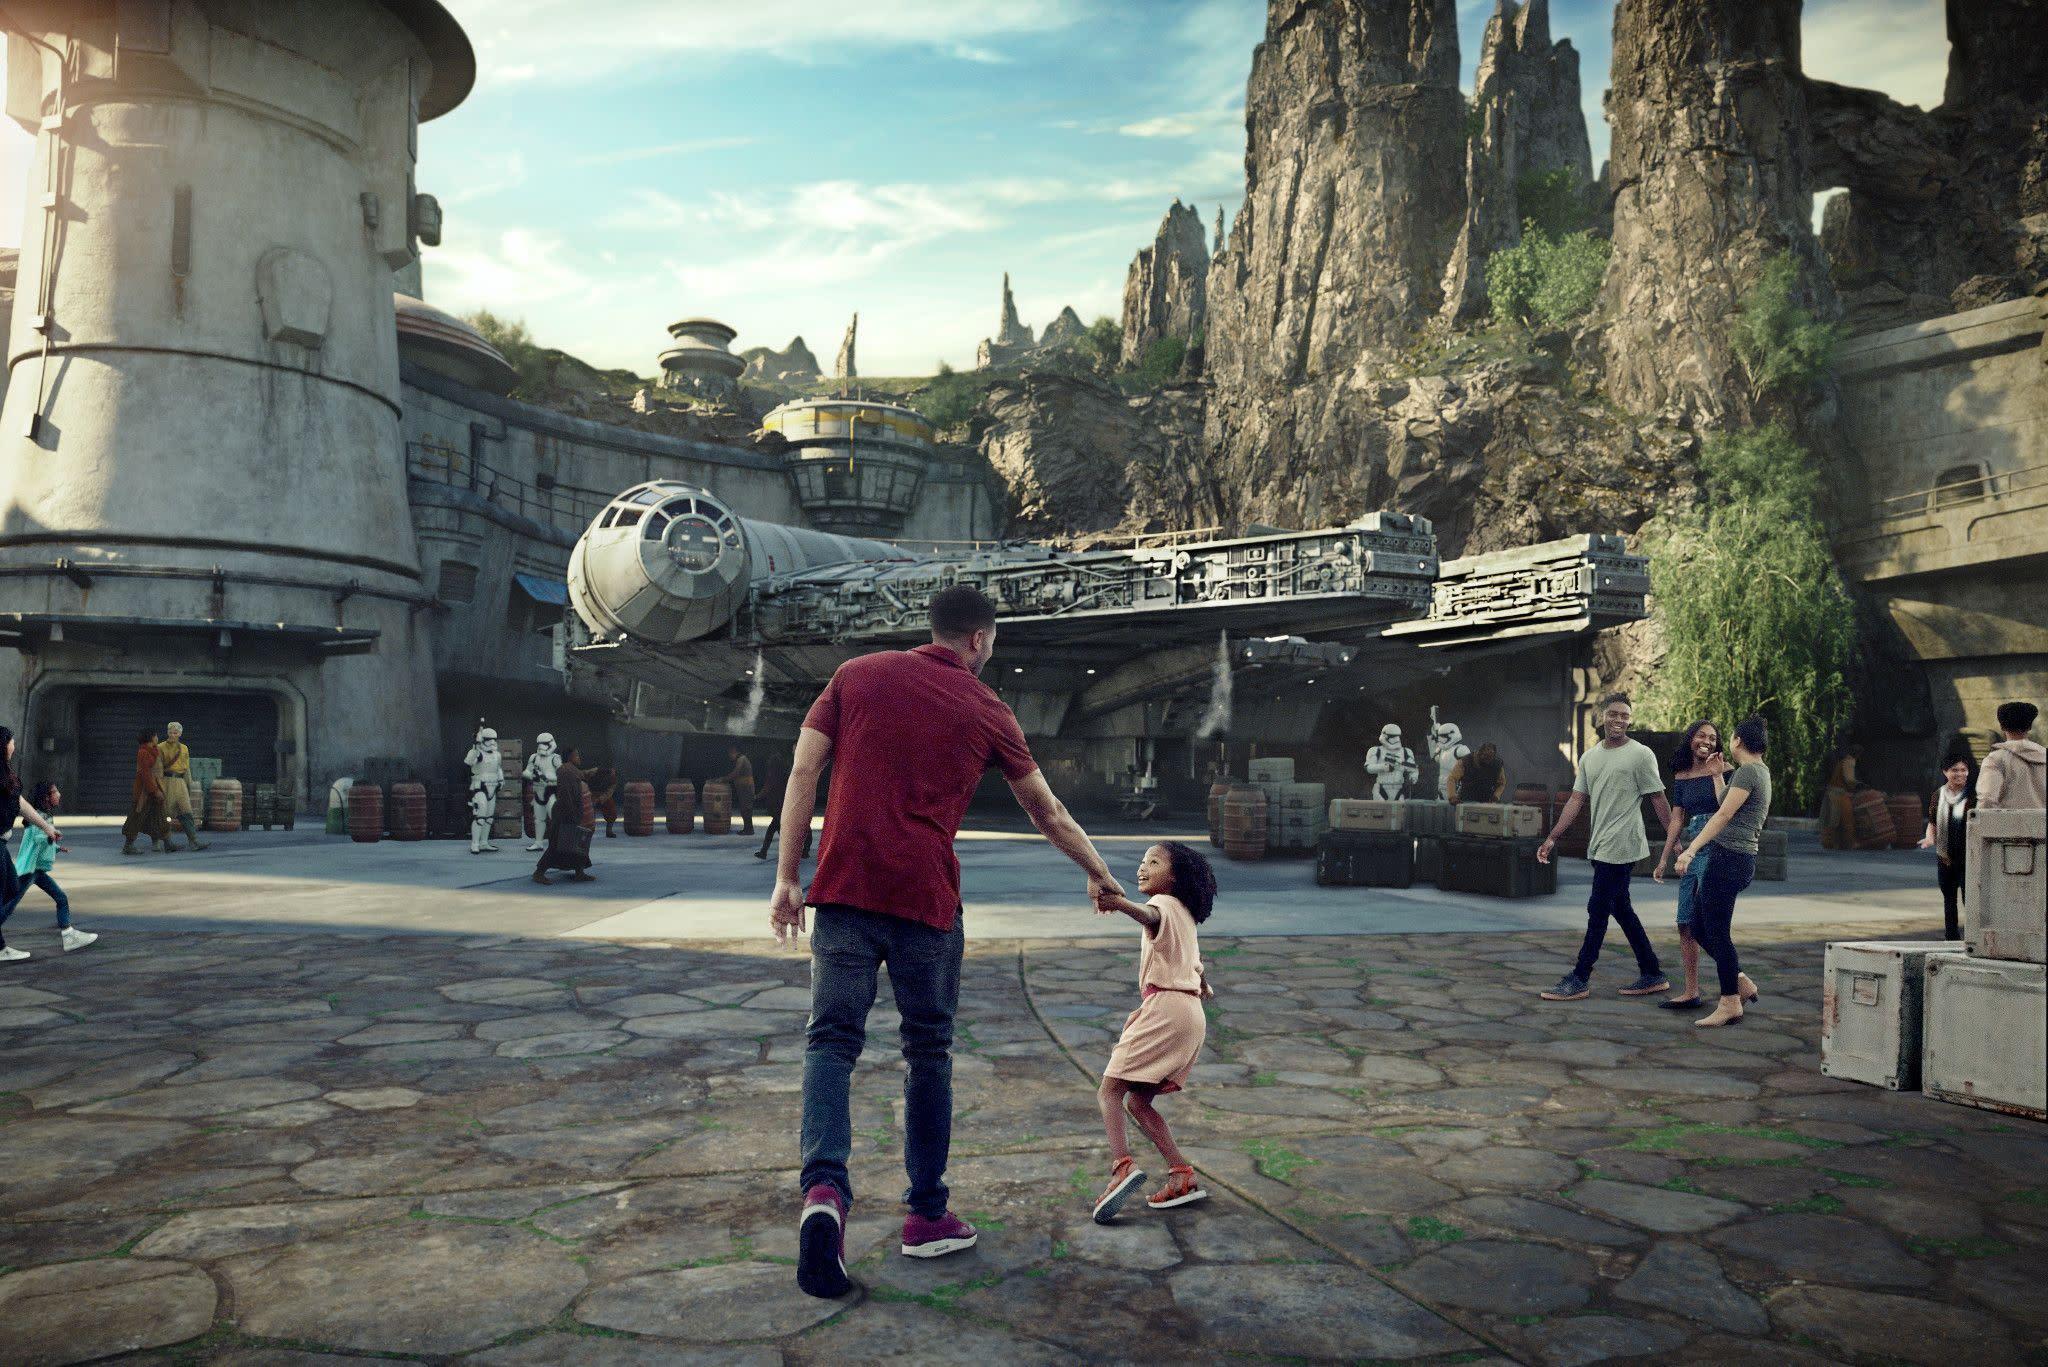 Millennium Falcon: Smugglers Run at Disney's Hollywood Studios in Orlando